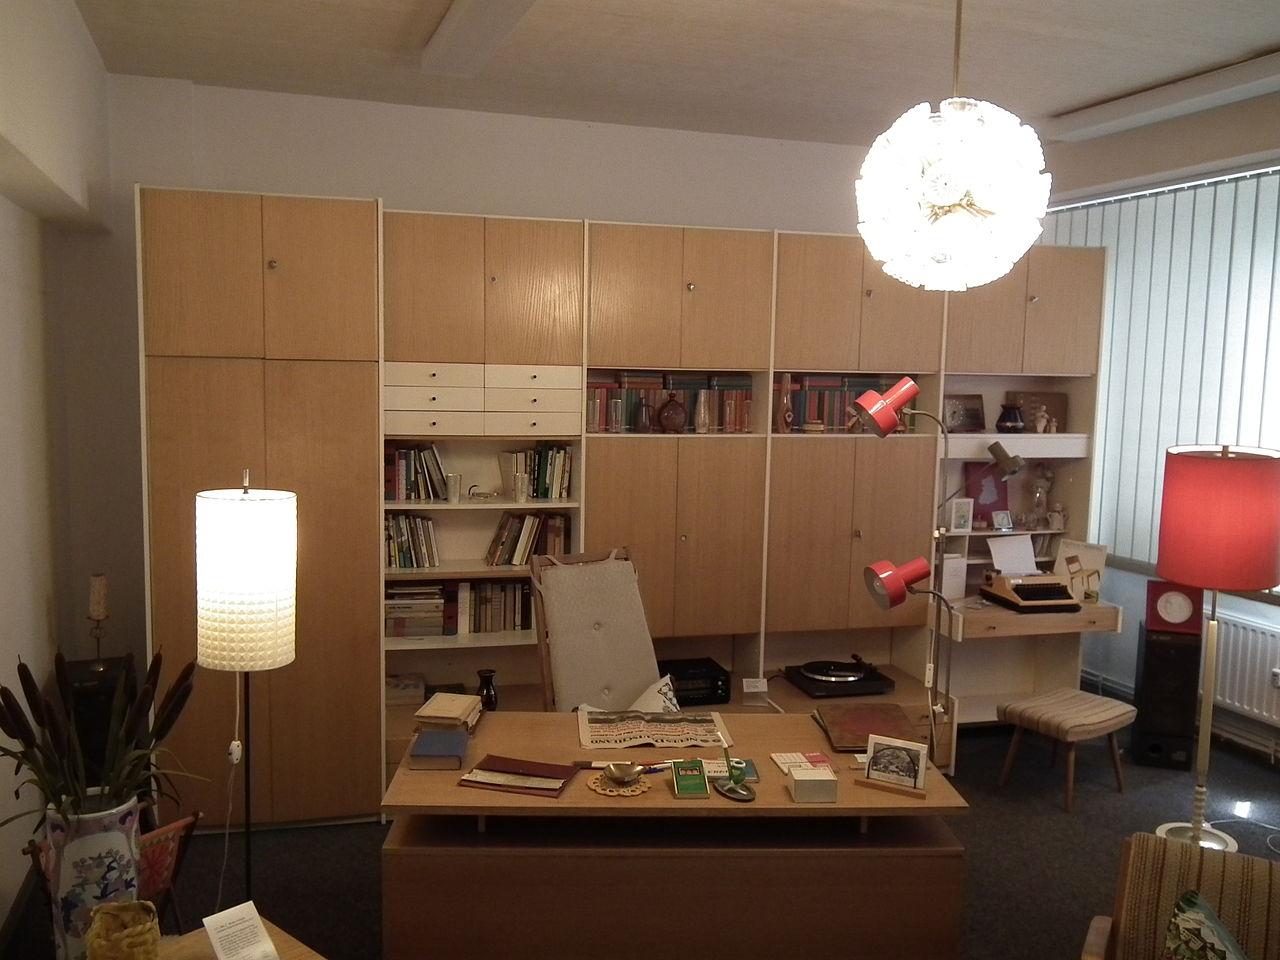 File:DDR Museum Zeitreise Radebeul Arbeitszimmer.jpg - Wikimedia Commons